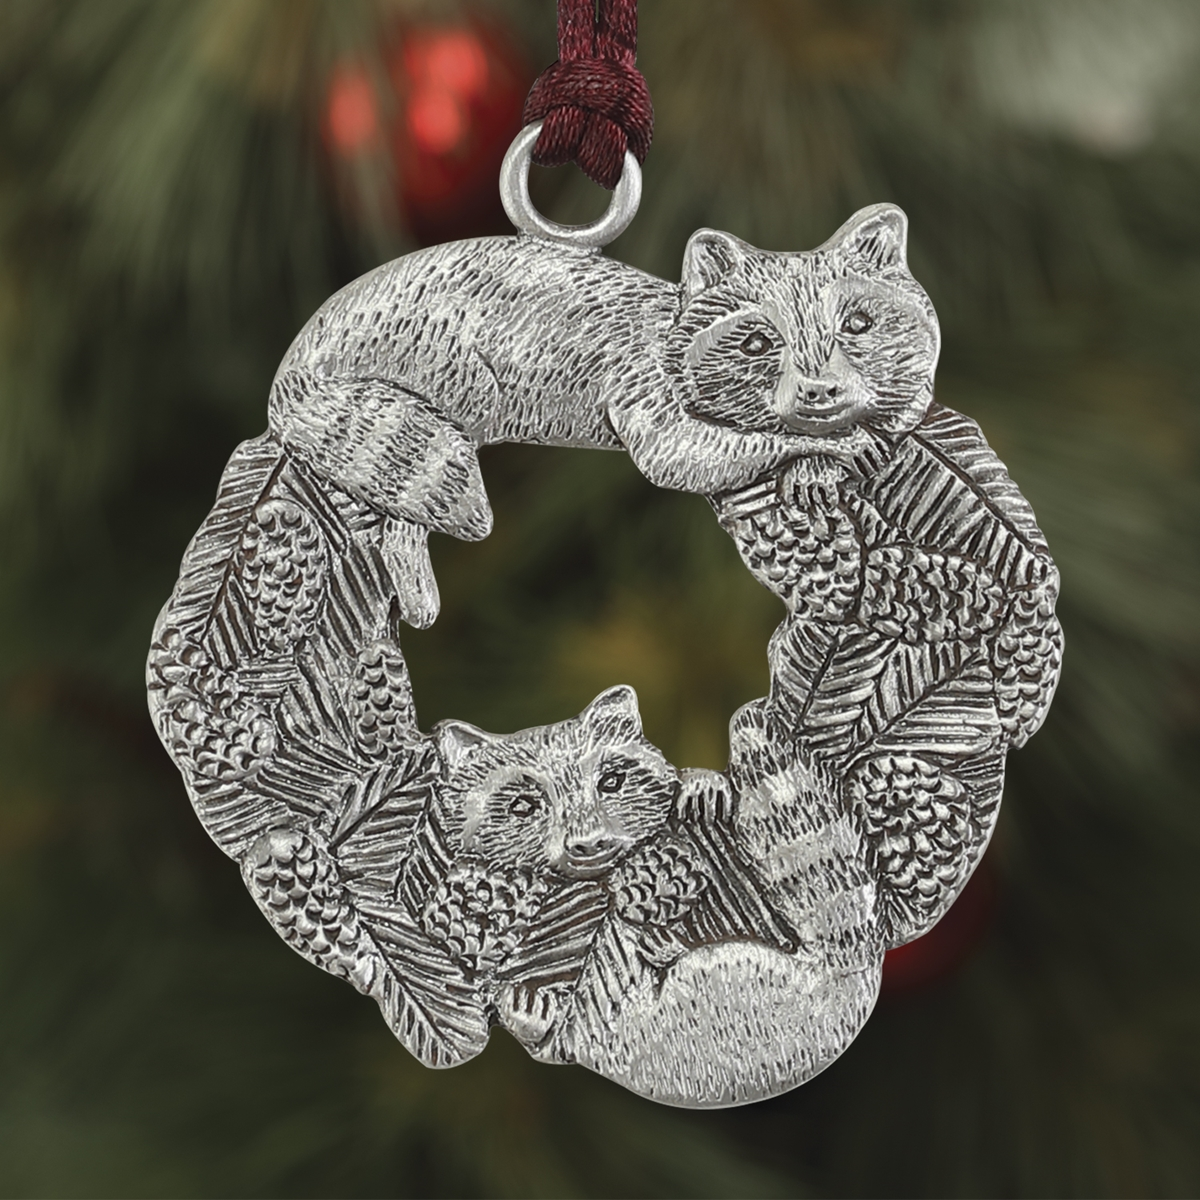 Raccoons Plant a Tree Ornament